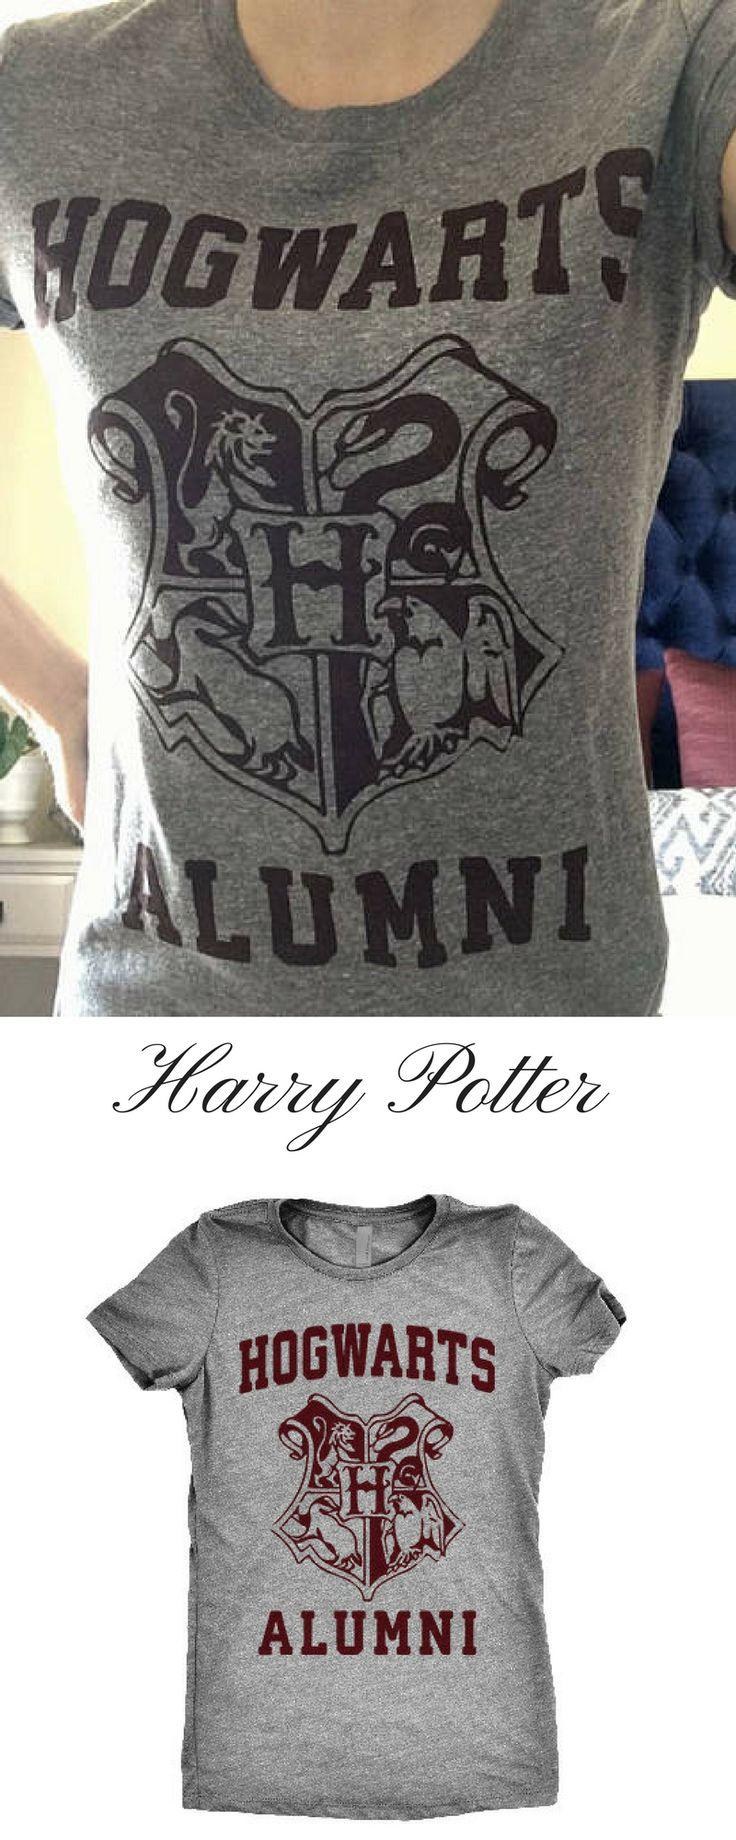 Hogwarts Alumni T-Shirt #Harrypotter #hogwarts  #christmasgifts  #affiliate